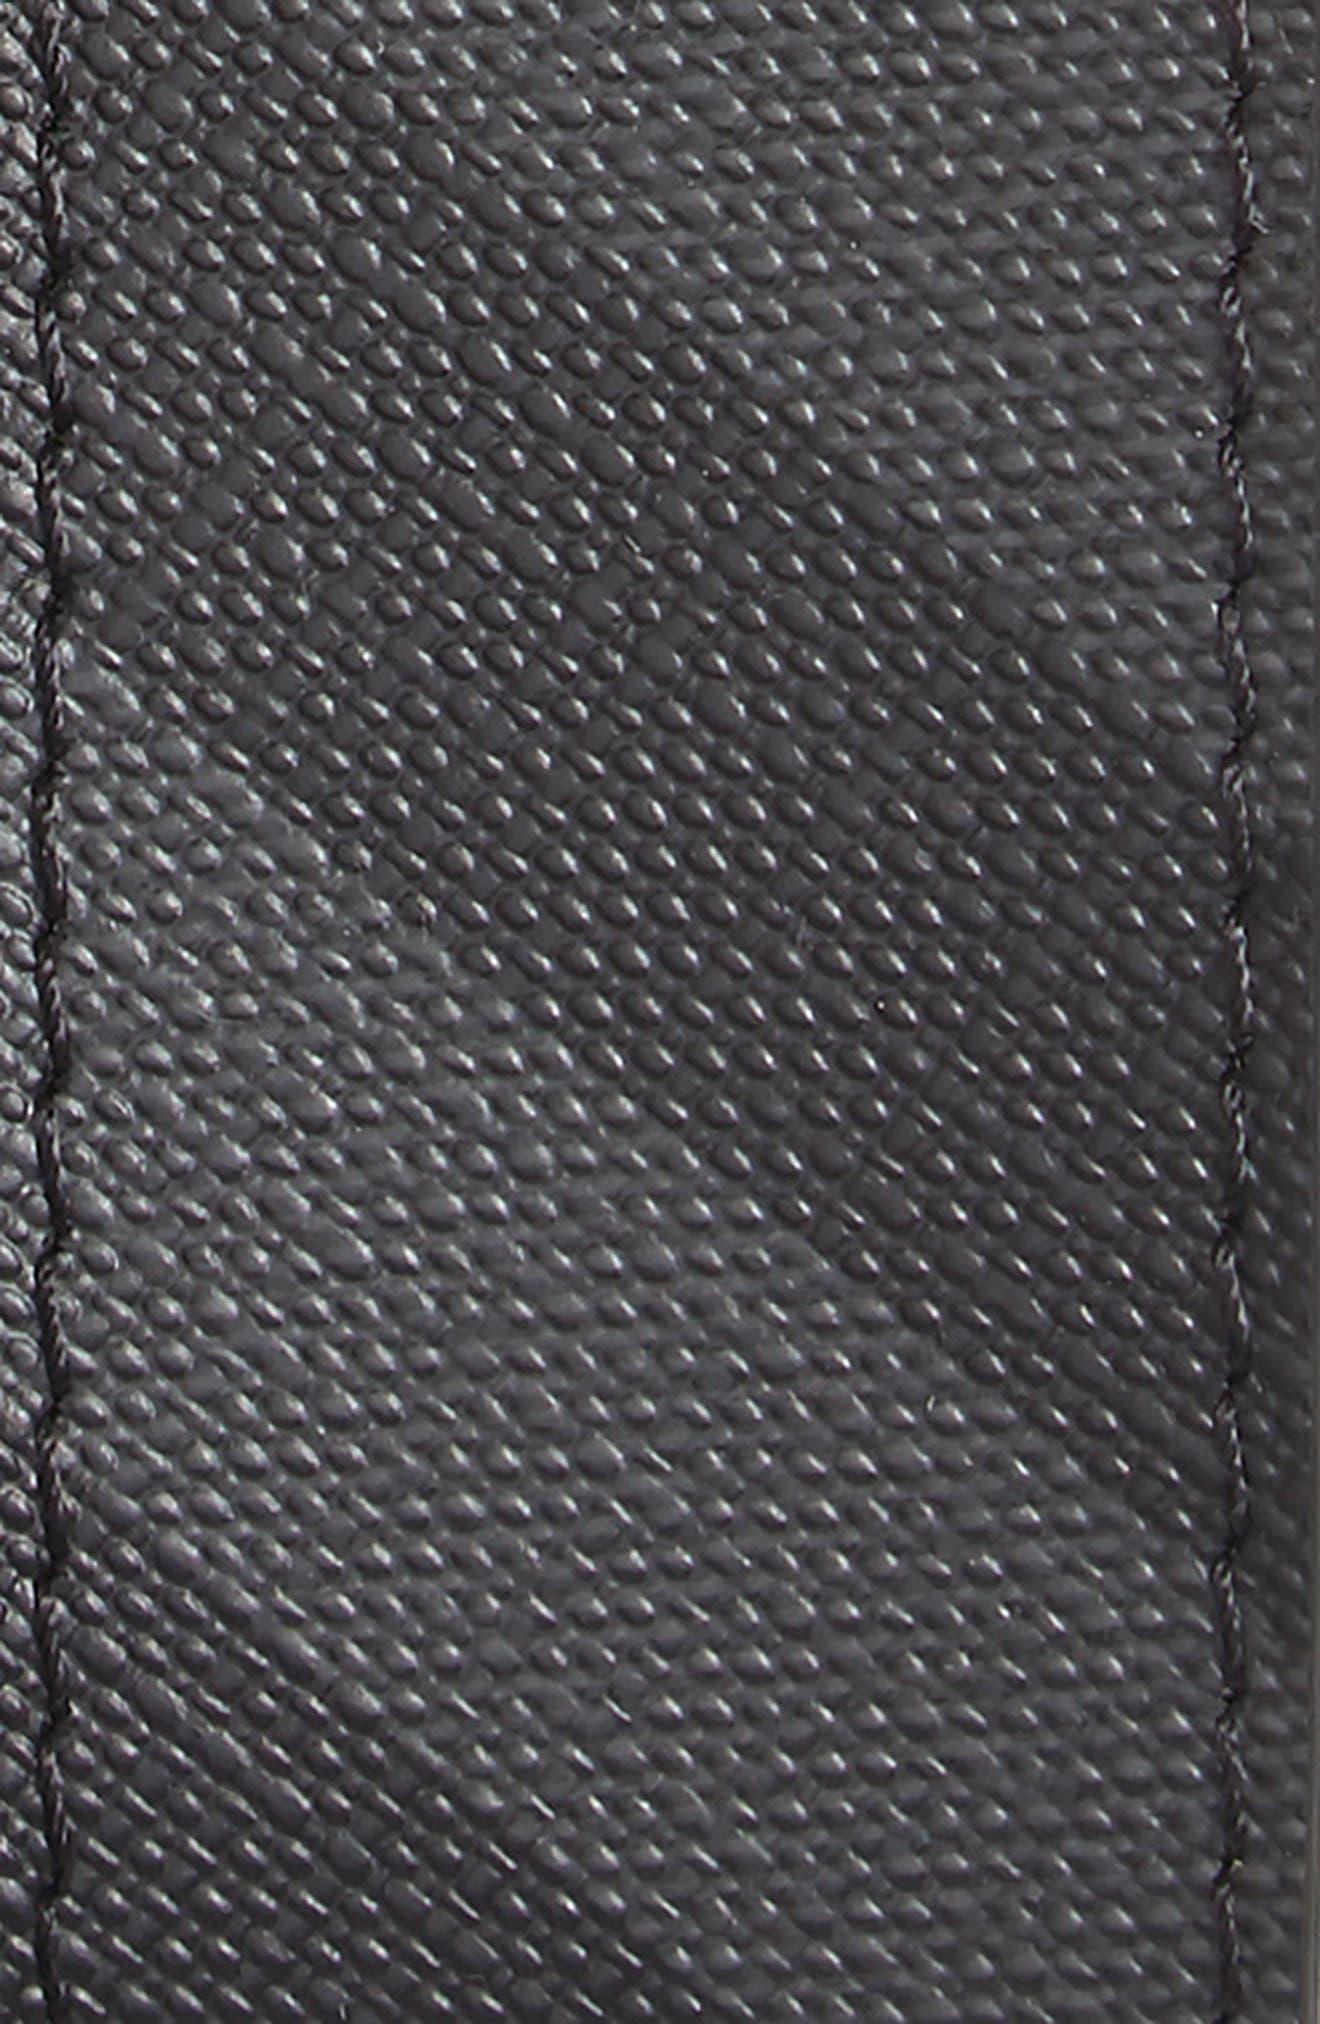 London Check George Reversible Belt,                             Alternate thumbnail 2, color,                             Charcoal/ Black